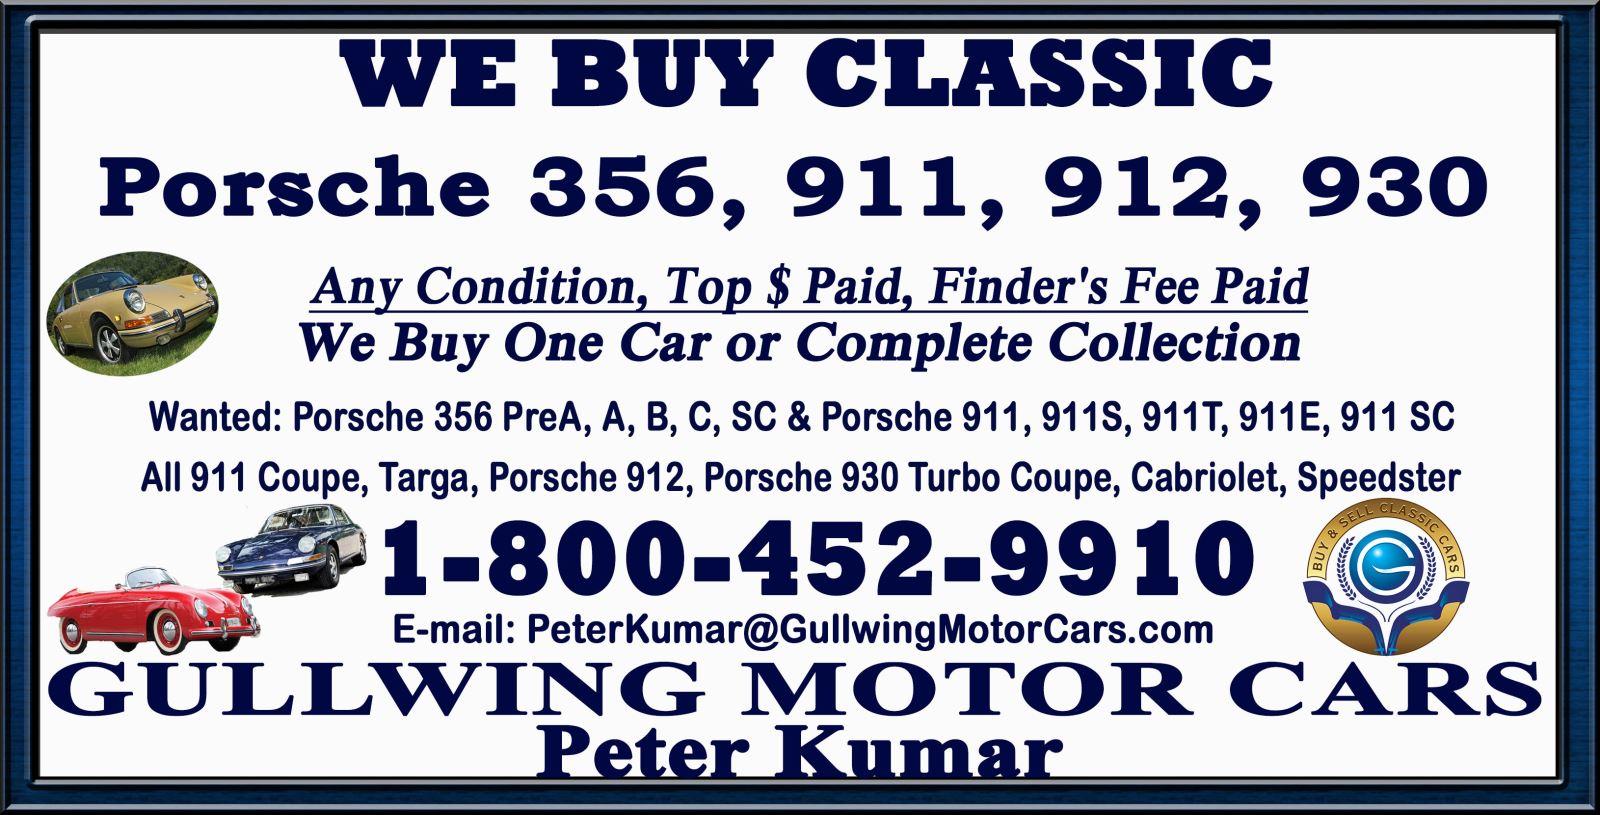 Sell Classic Porsche | Call Gullwing Motor if Vintage Porsche For Sale